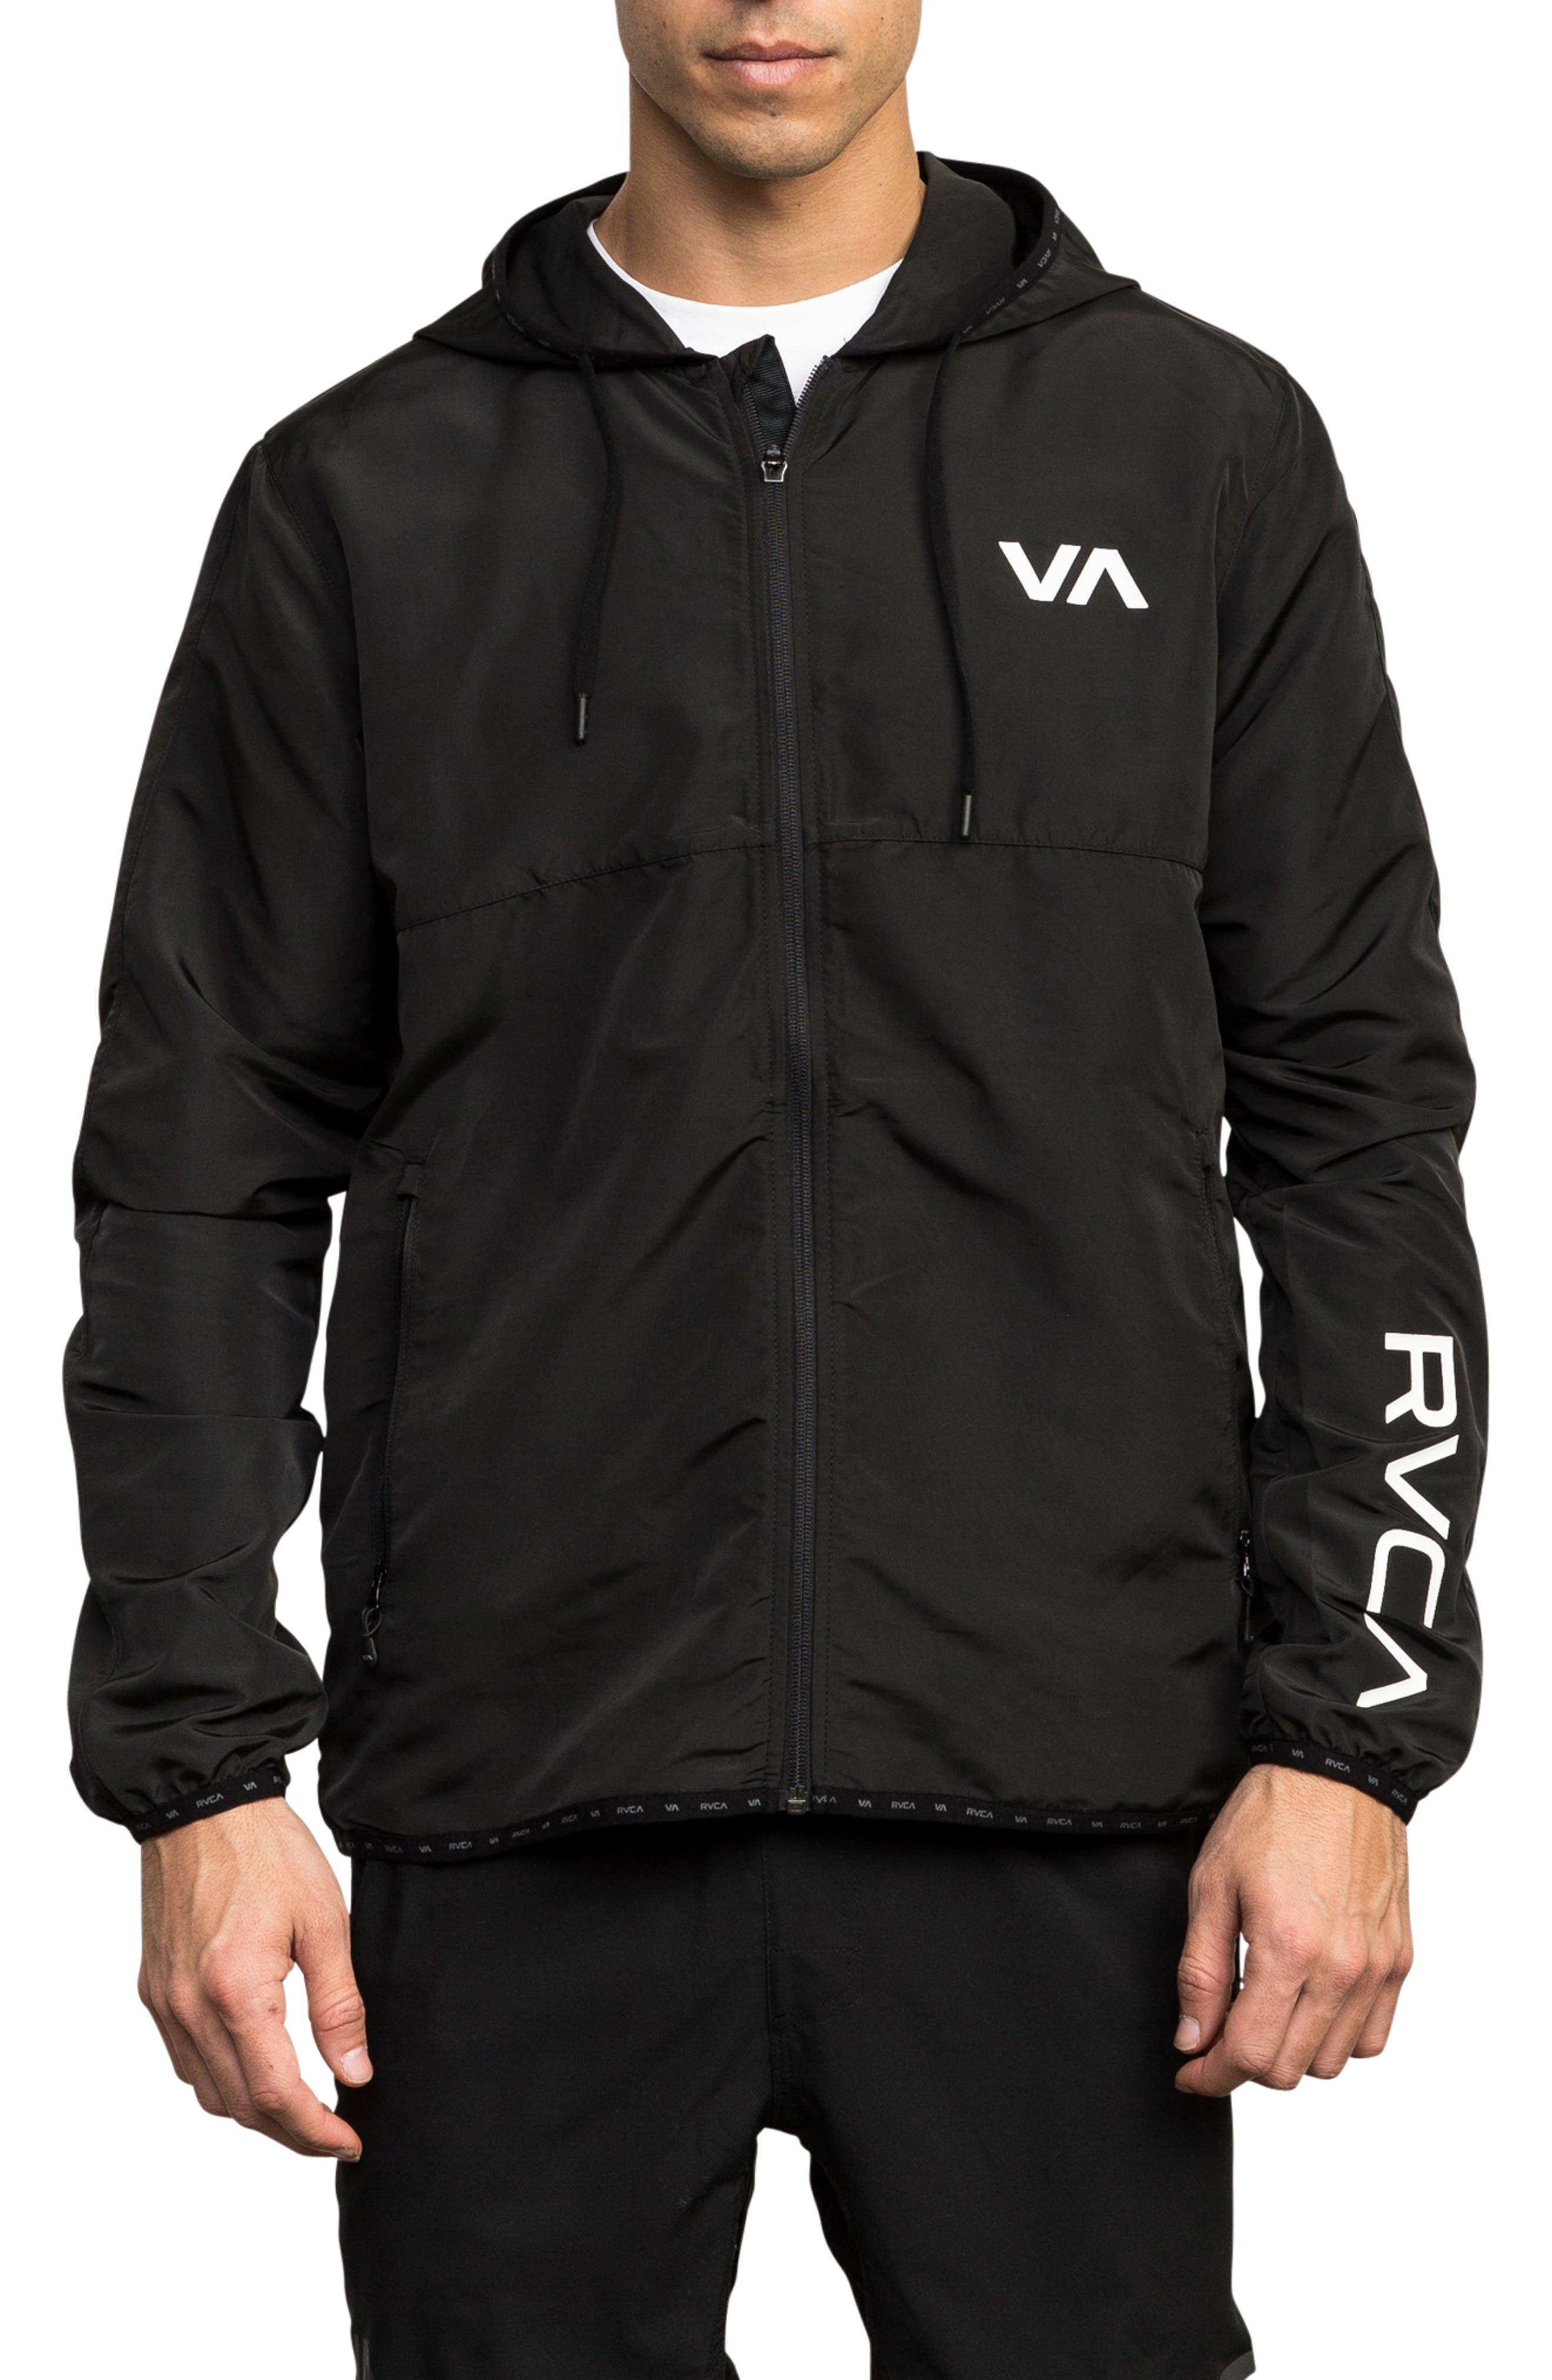 Axe Packable Water Resistant Jacket,                             Main thumbnail 1, color,                             BLACK